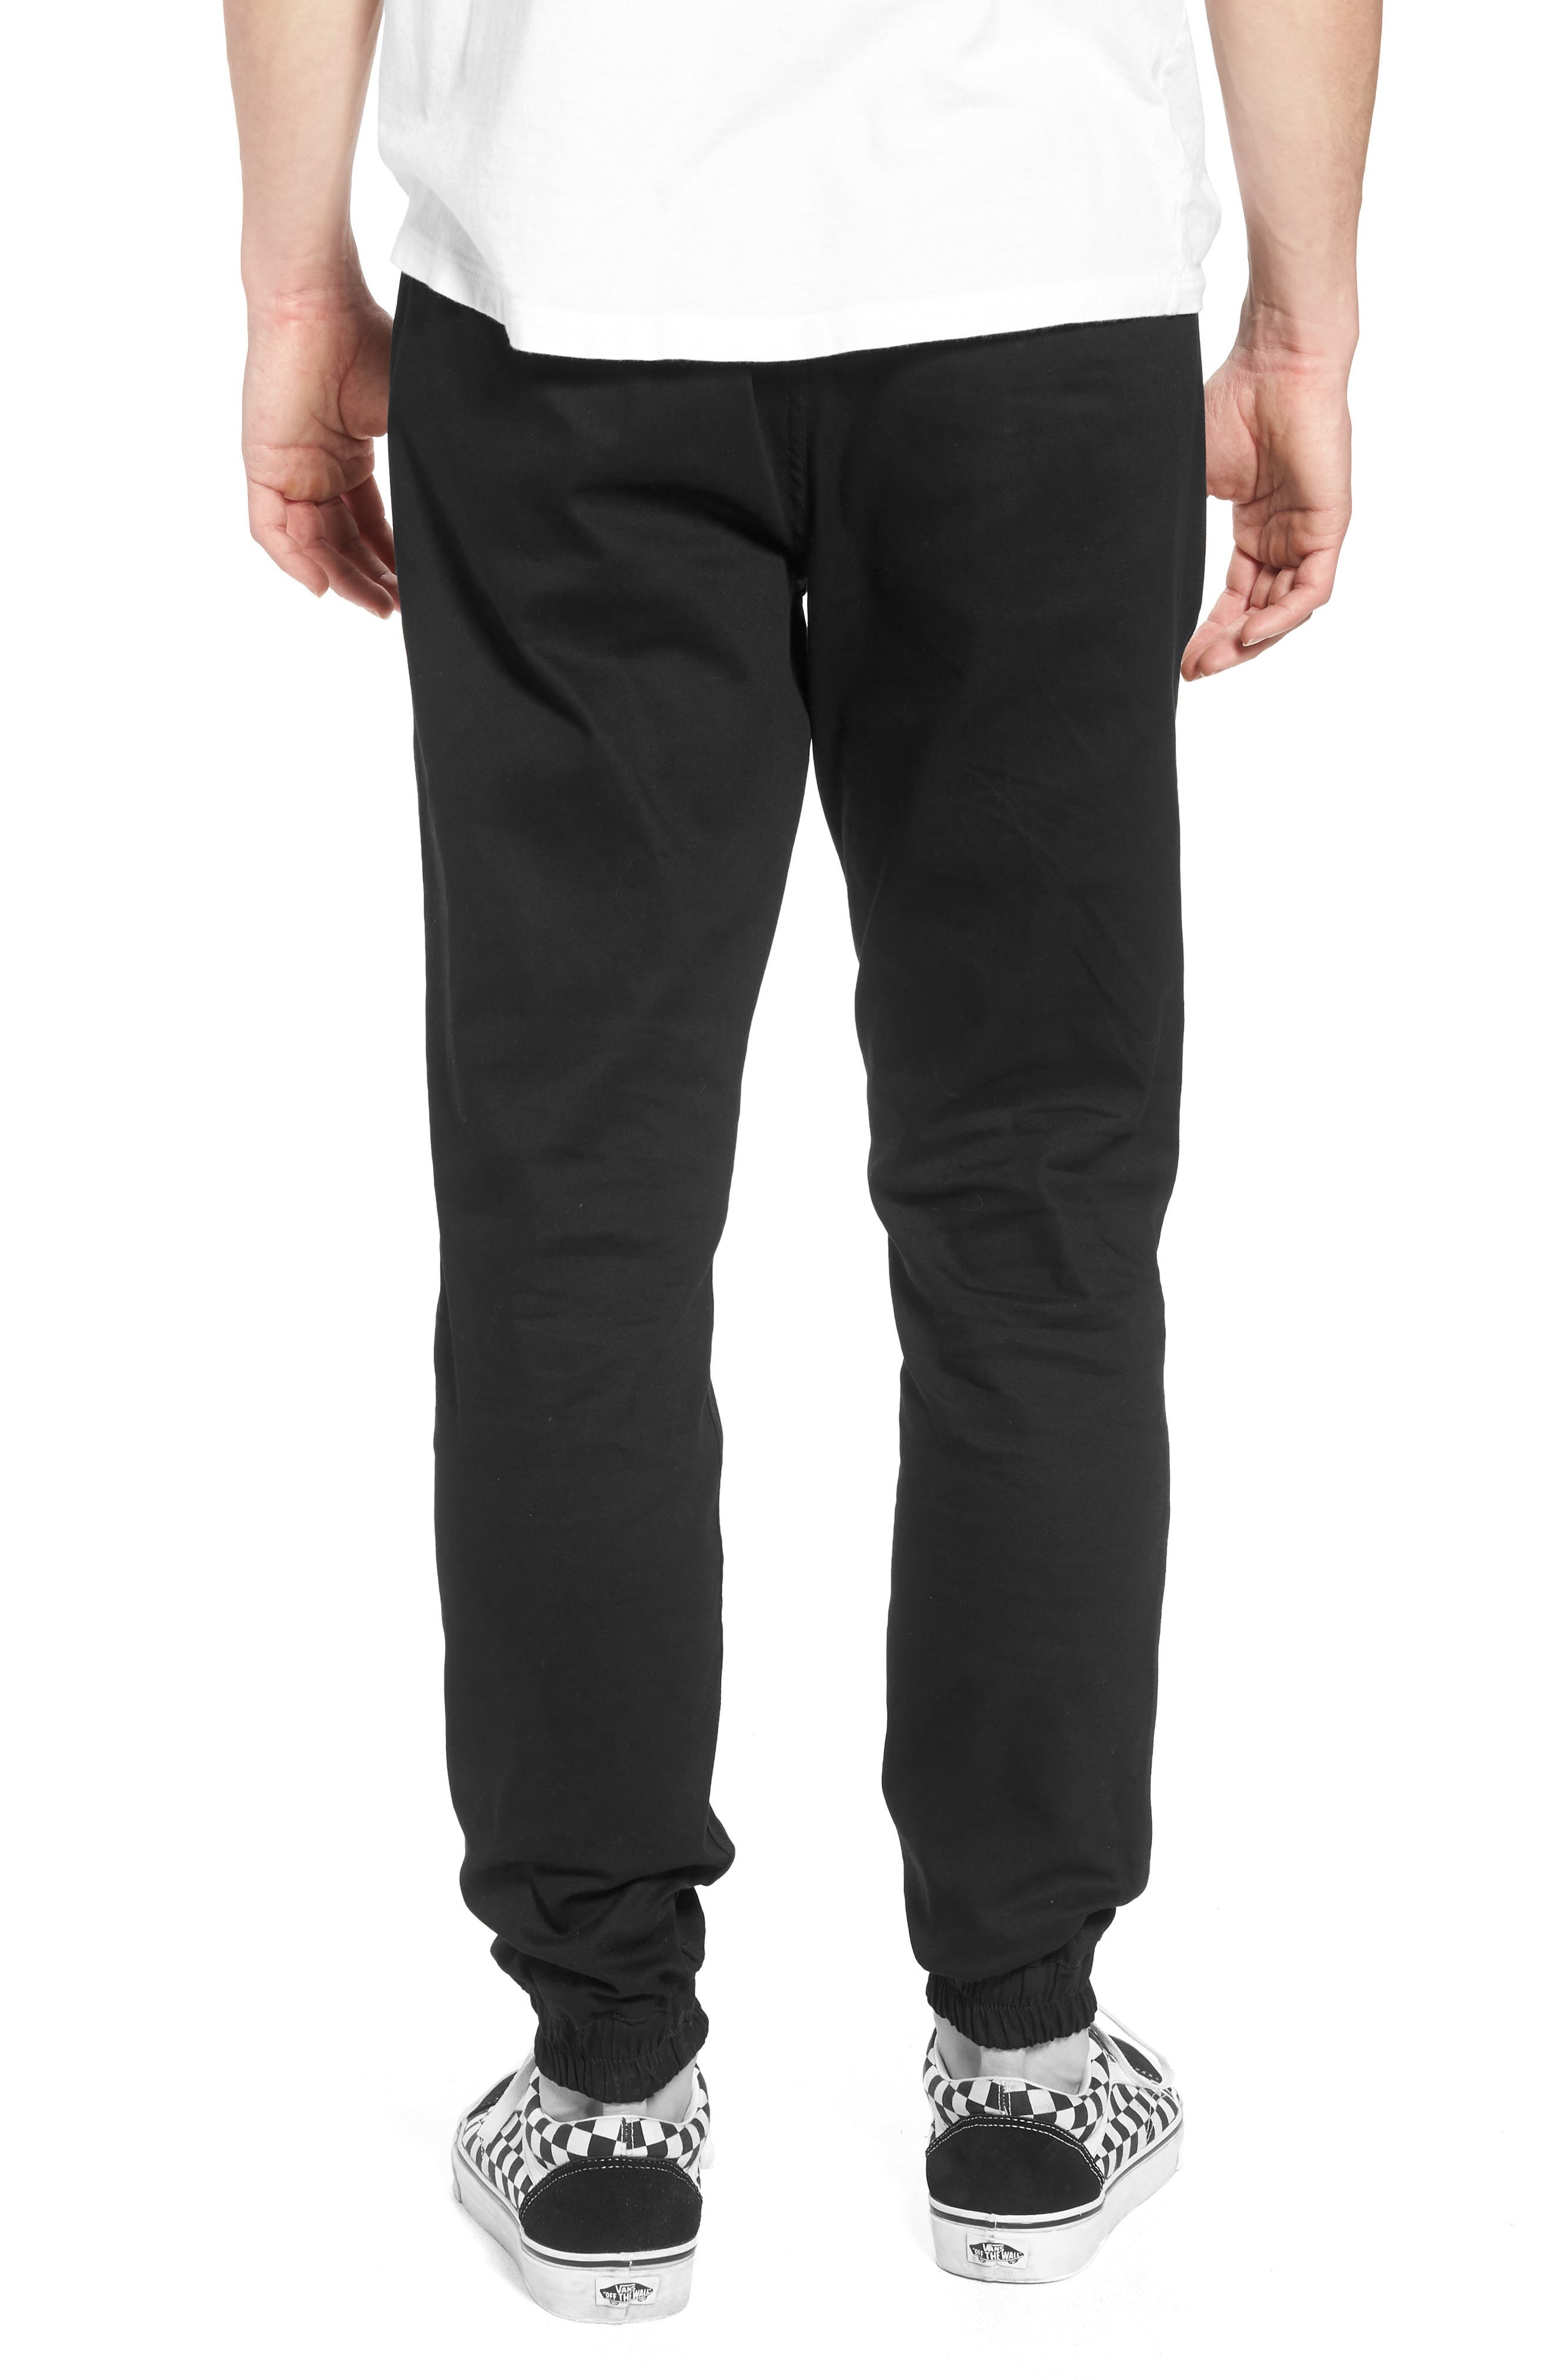 Runner Slim Fit Jogger Pants,                             Alternate thumbnail 2, color,                             Black